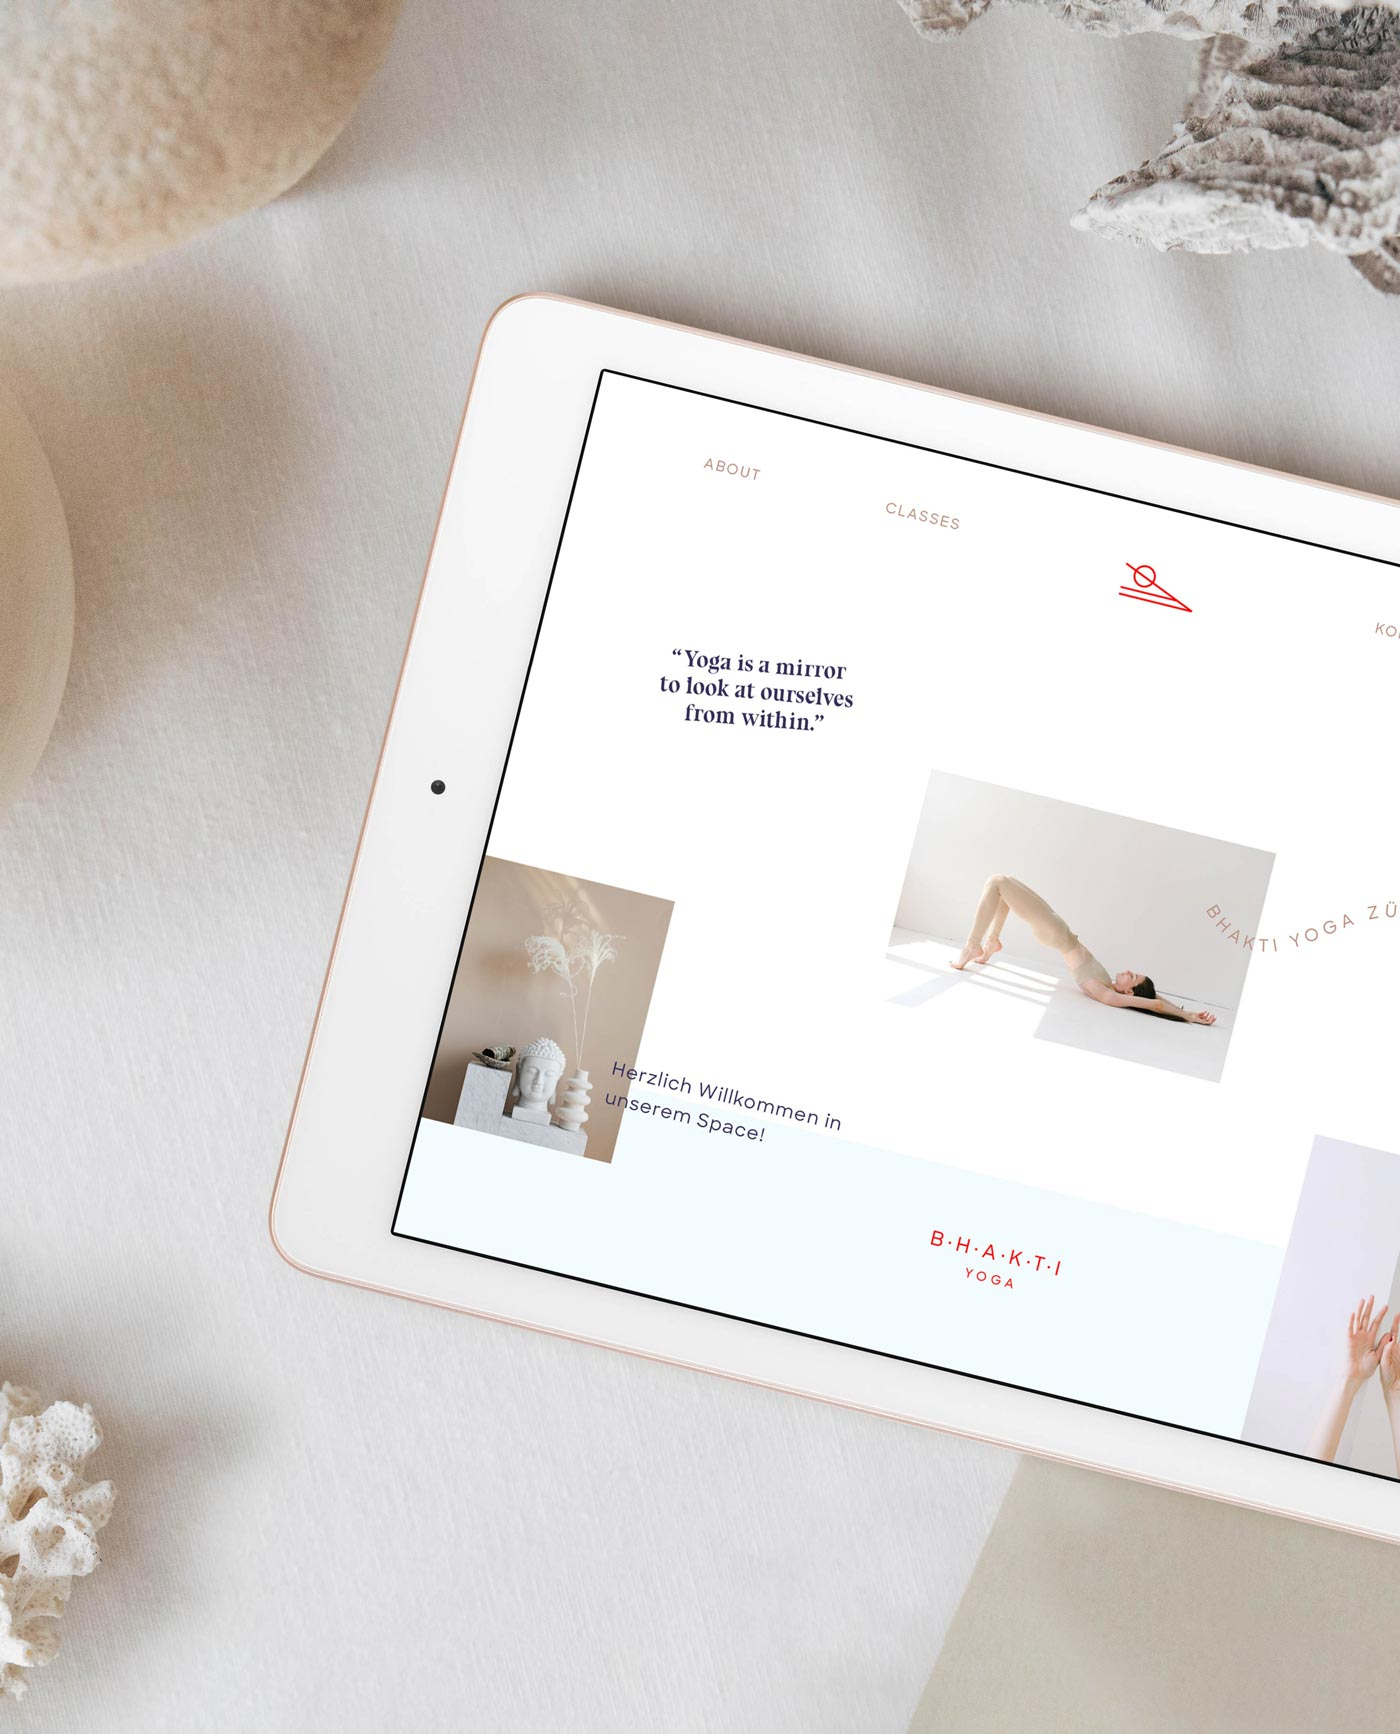 Bhakti Yoga Website   Web Design by Mindt